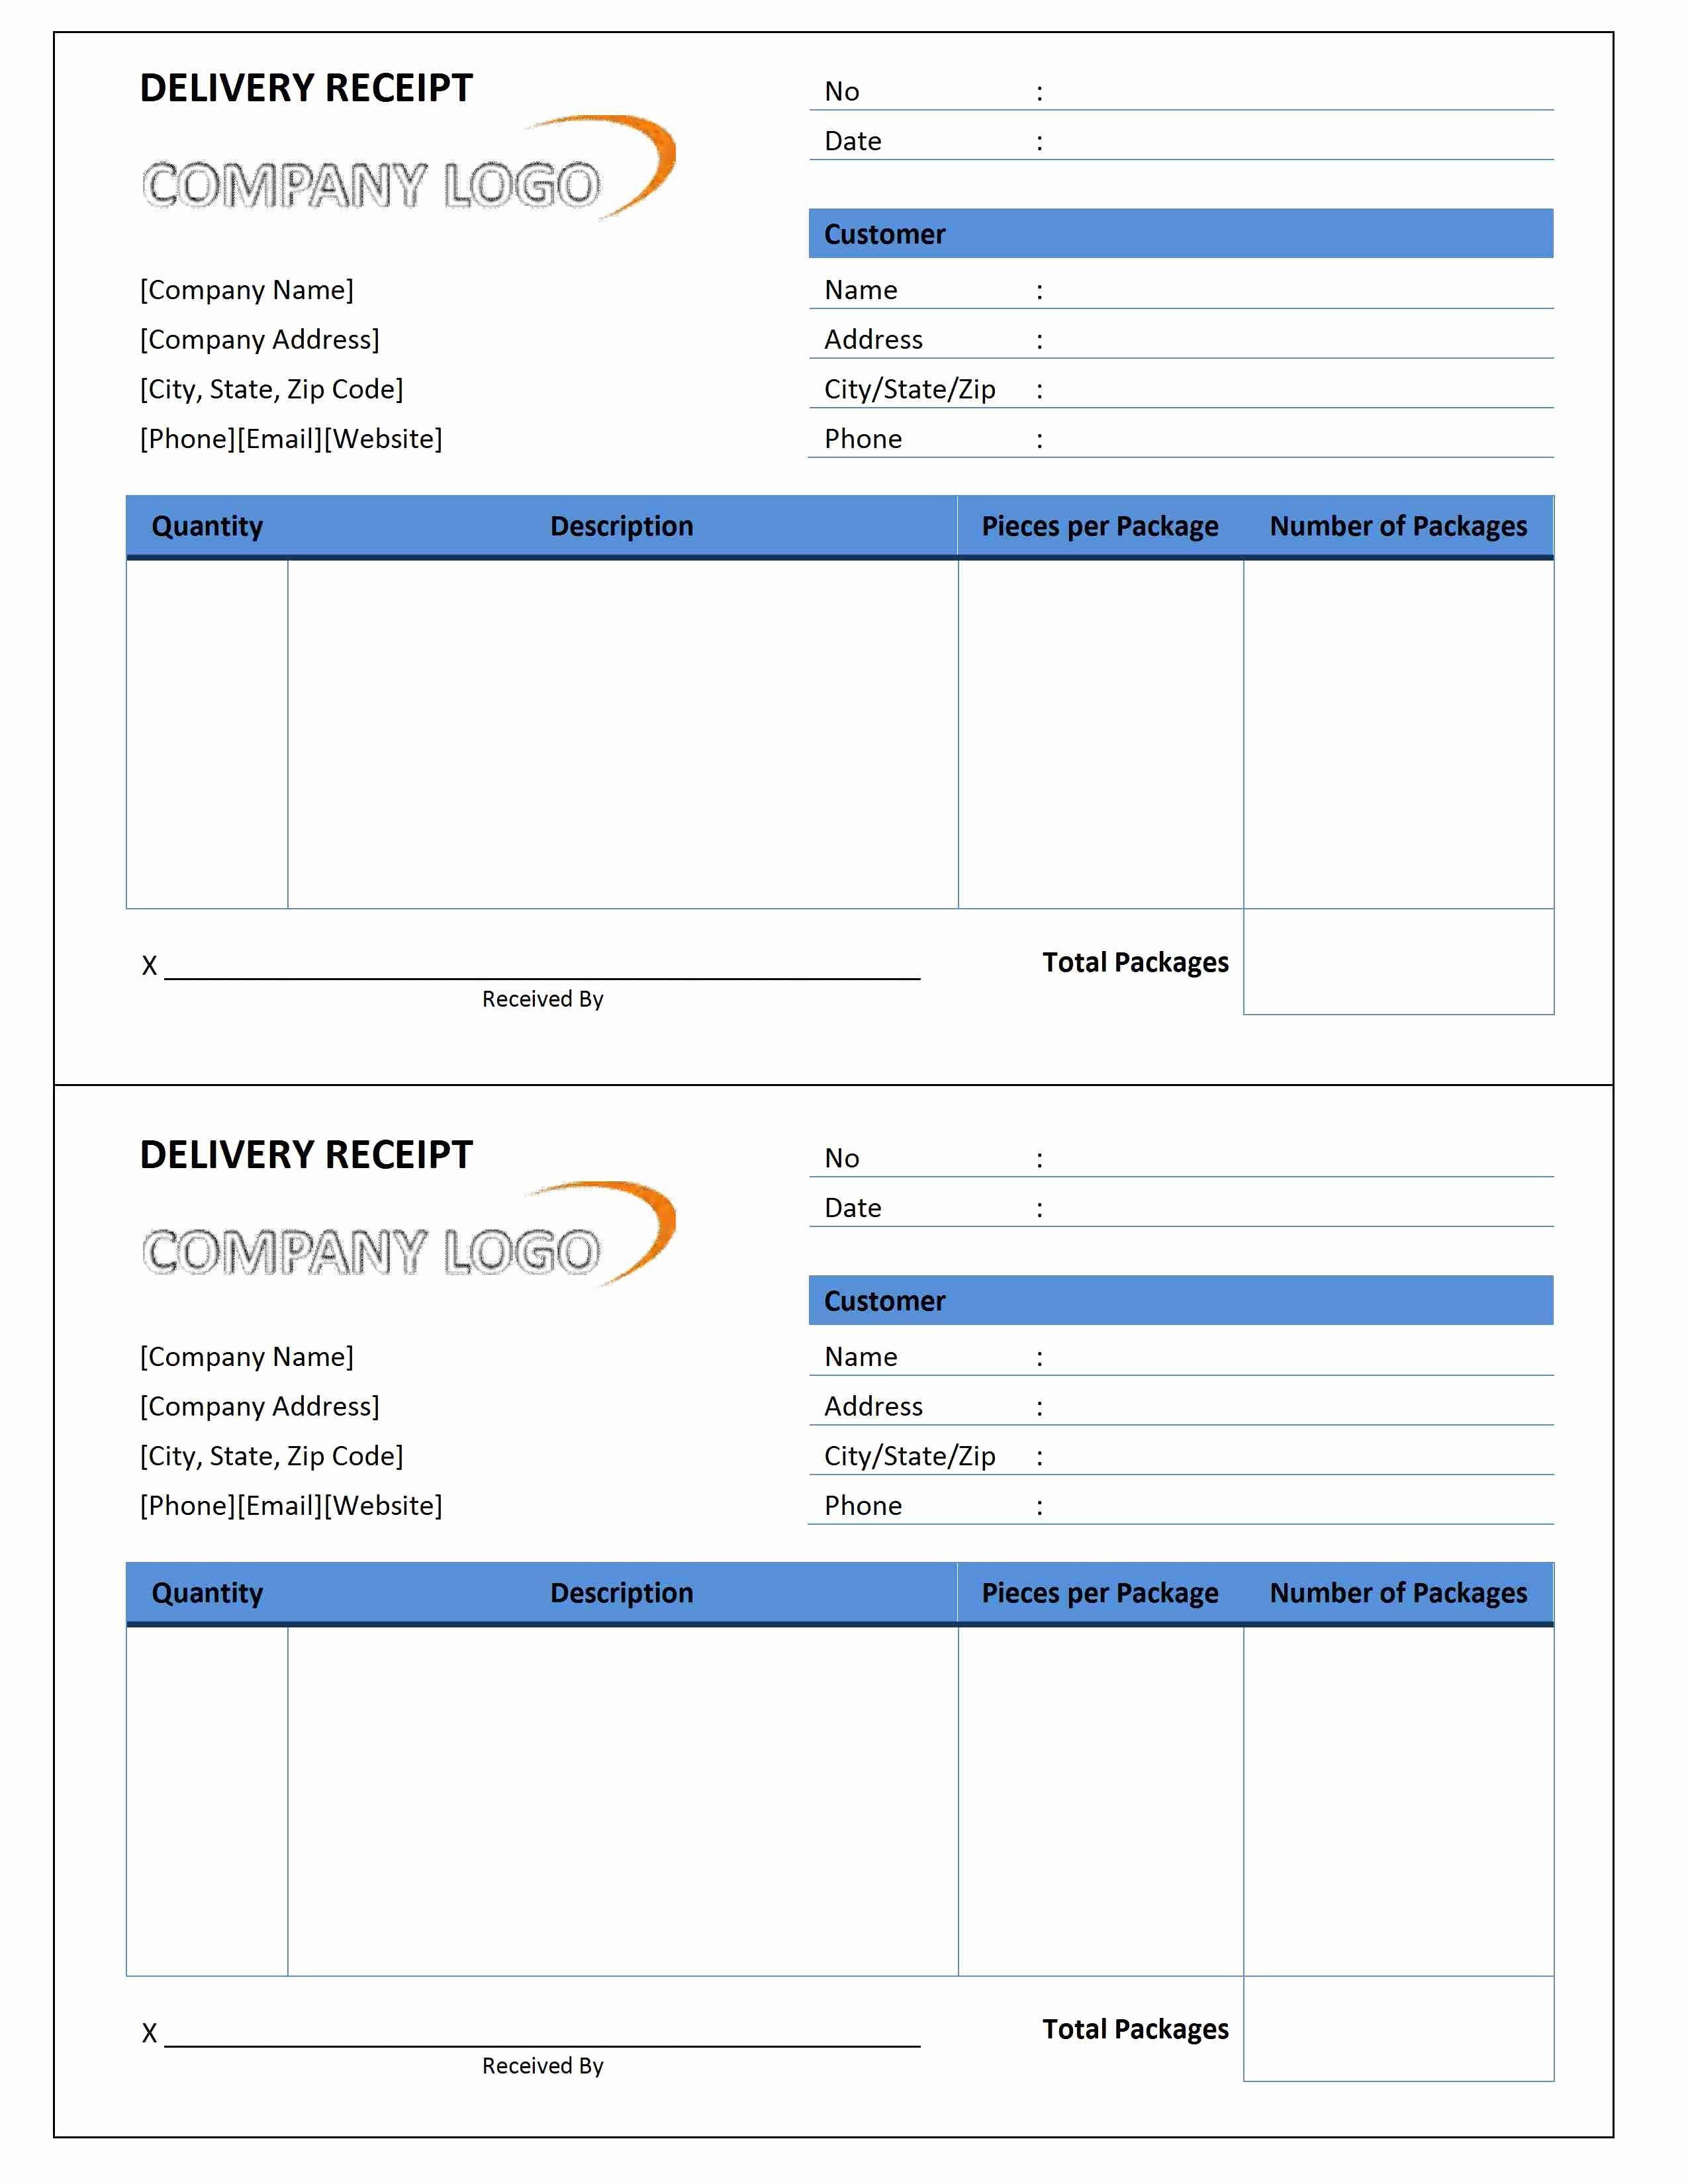 Microsoft Word Receipt Template New Receipt Archives Receipt Template Invoice Template Invoice Template Word